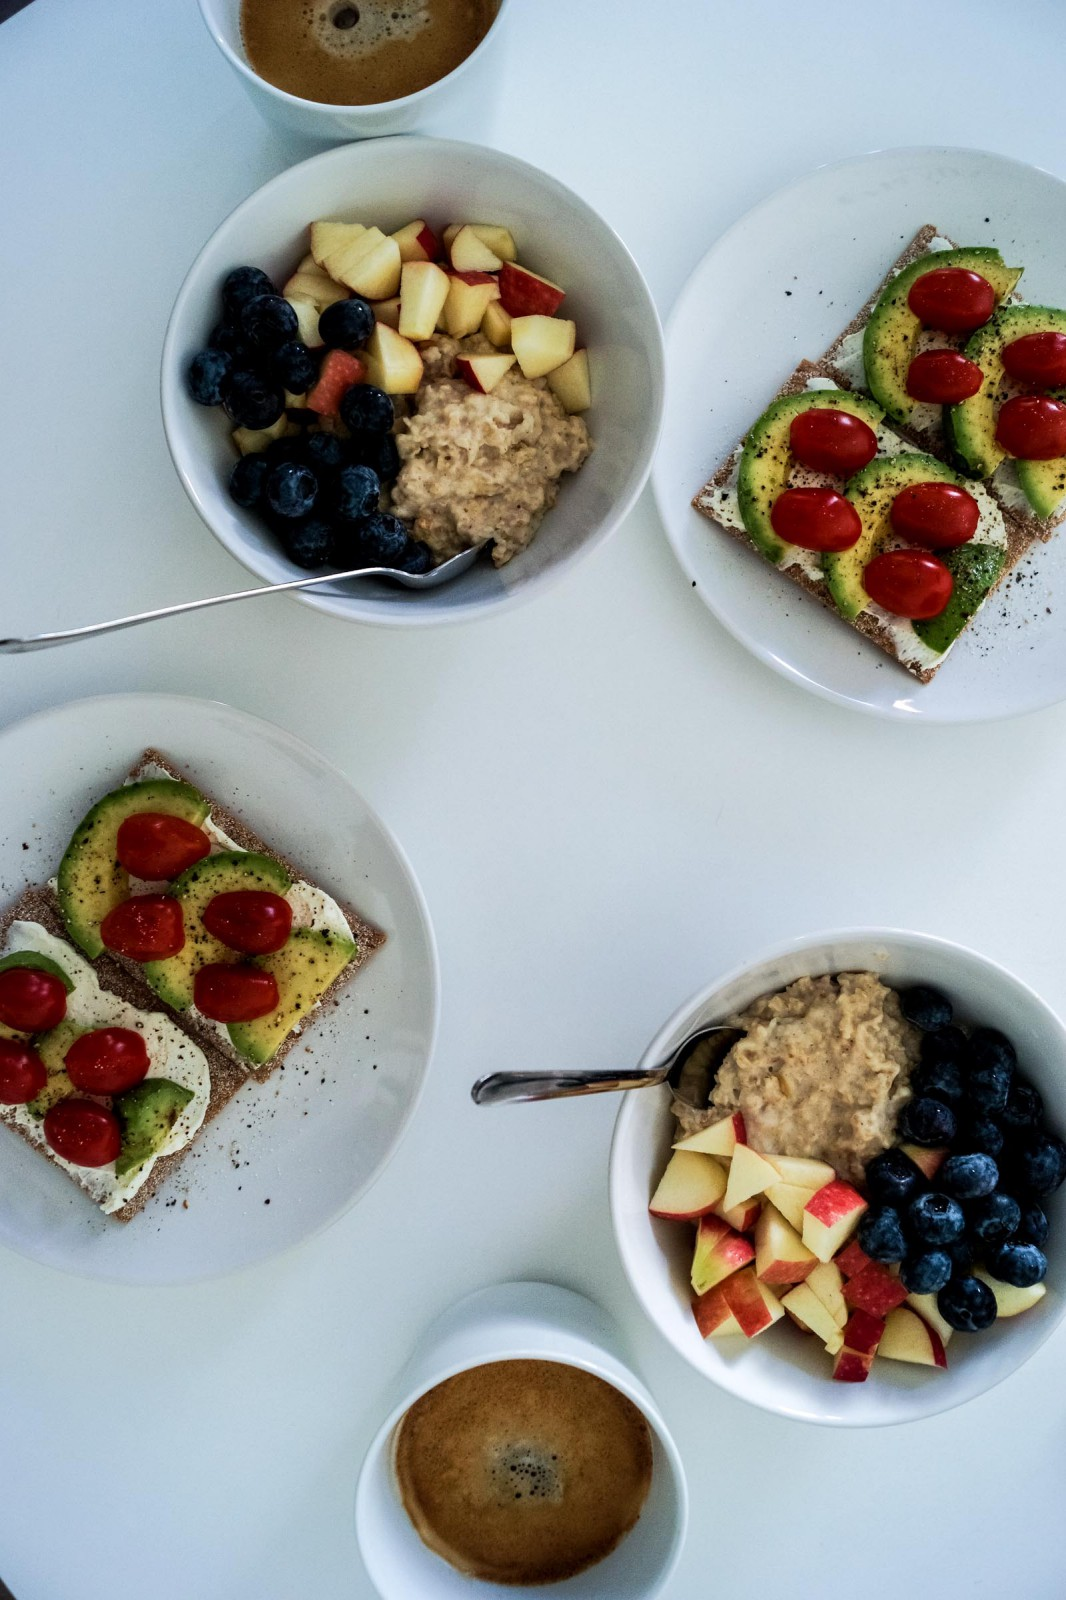 Avocado Bread for Breakfast